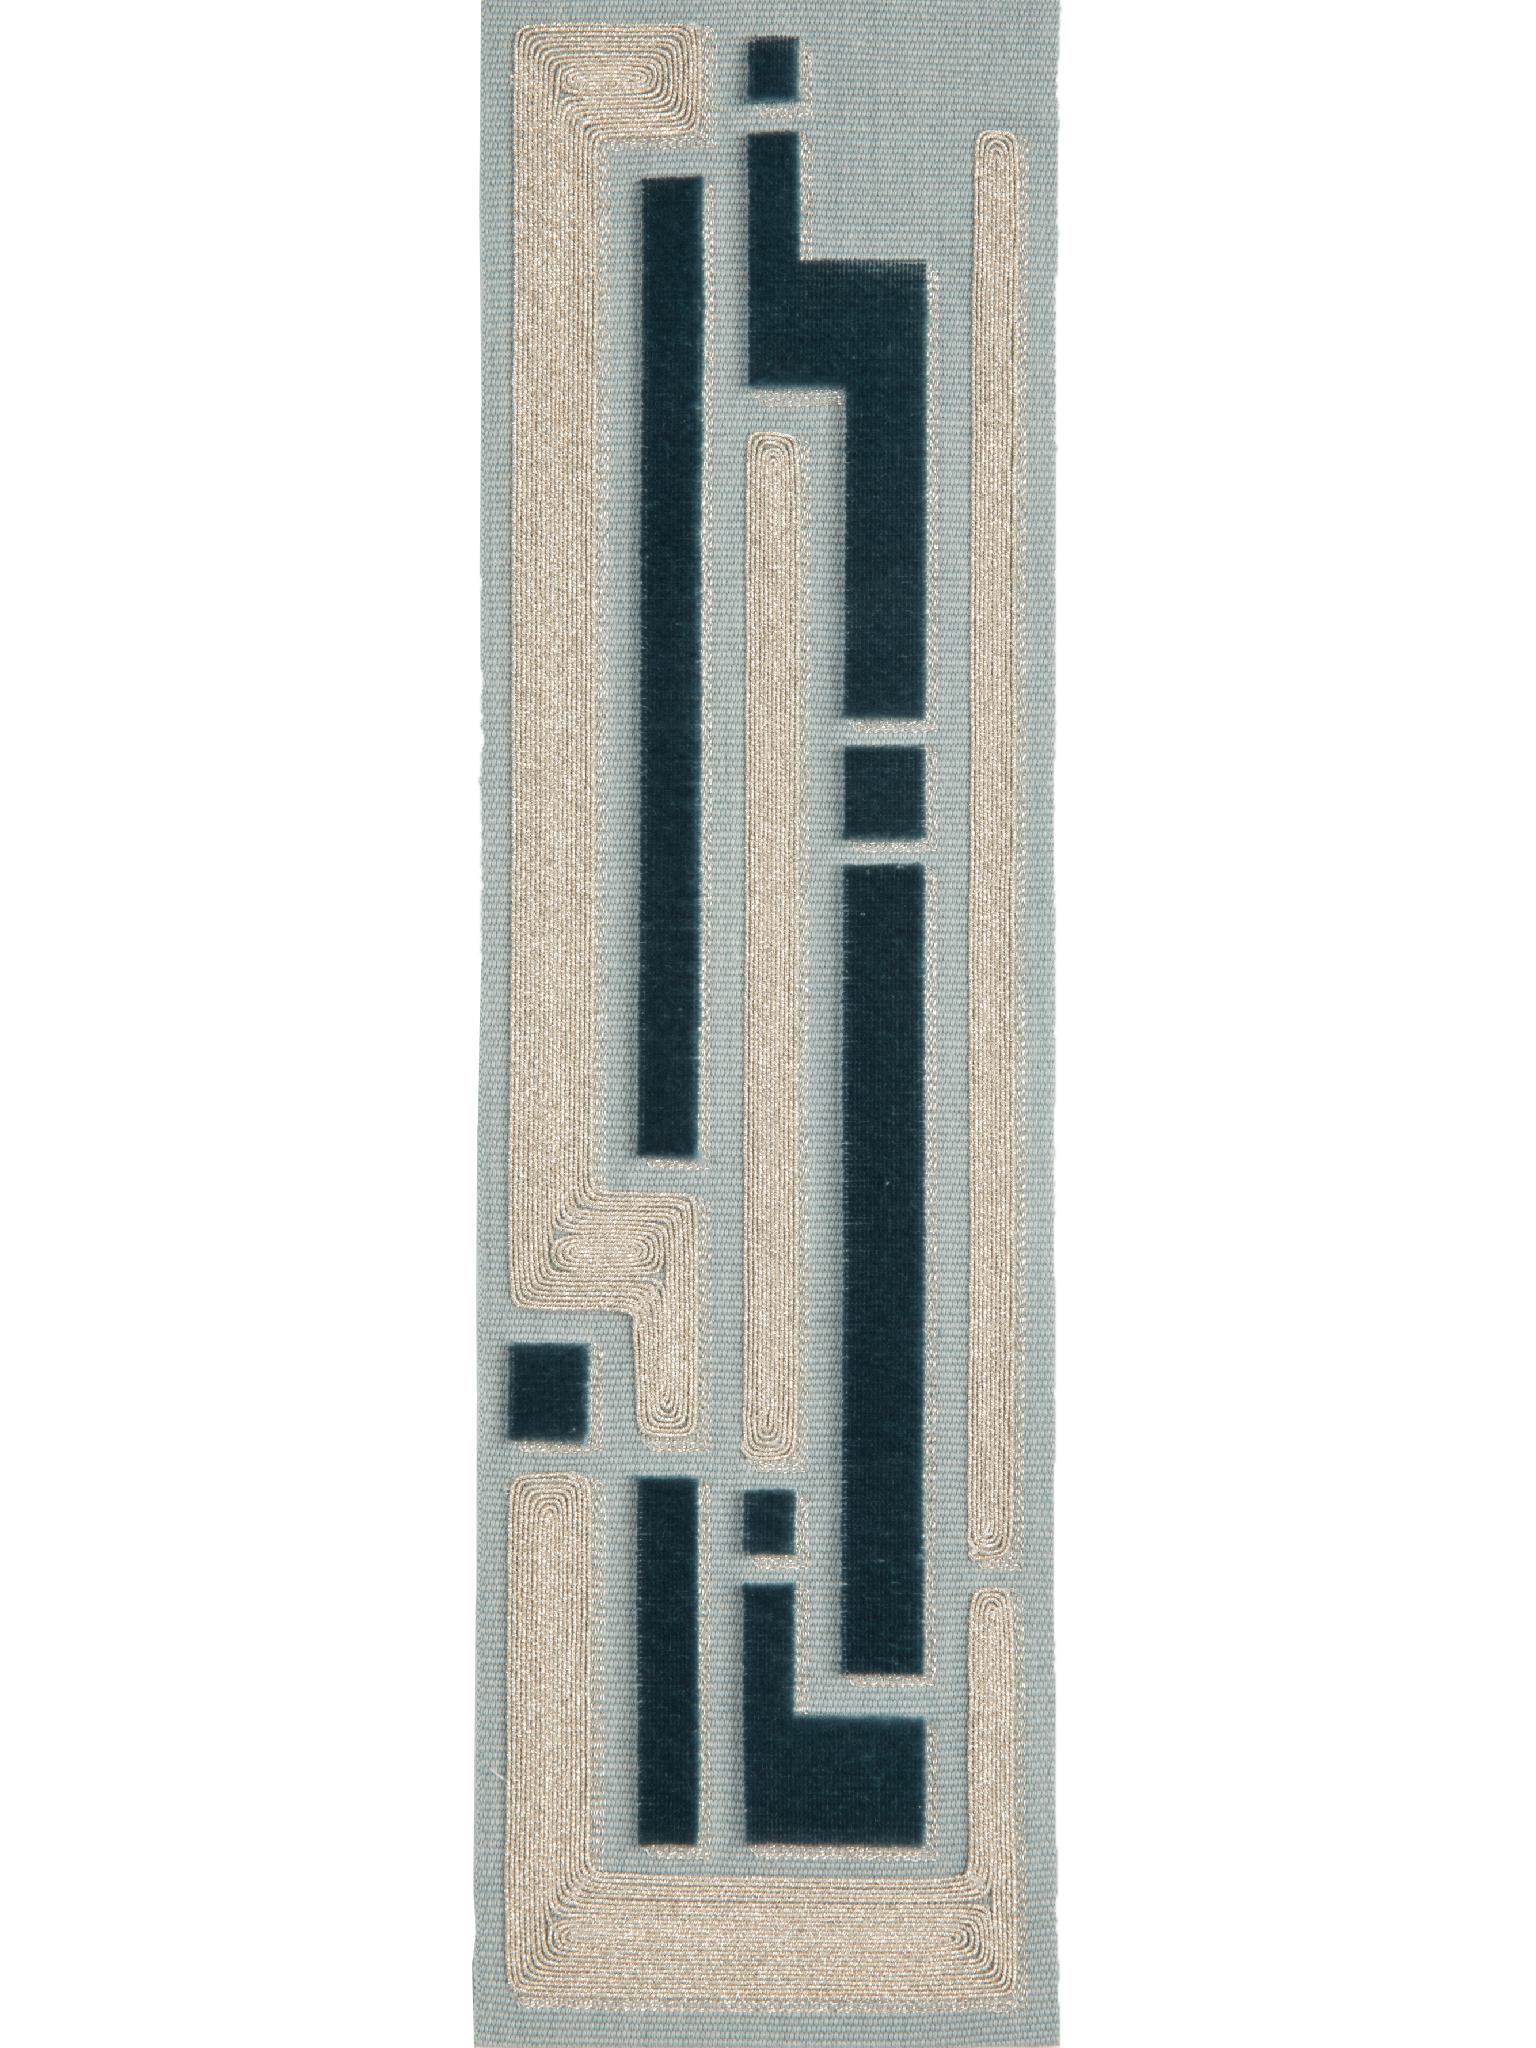 EMBTR096